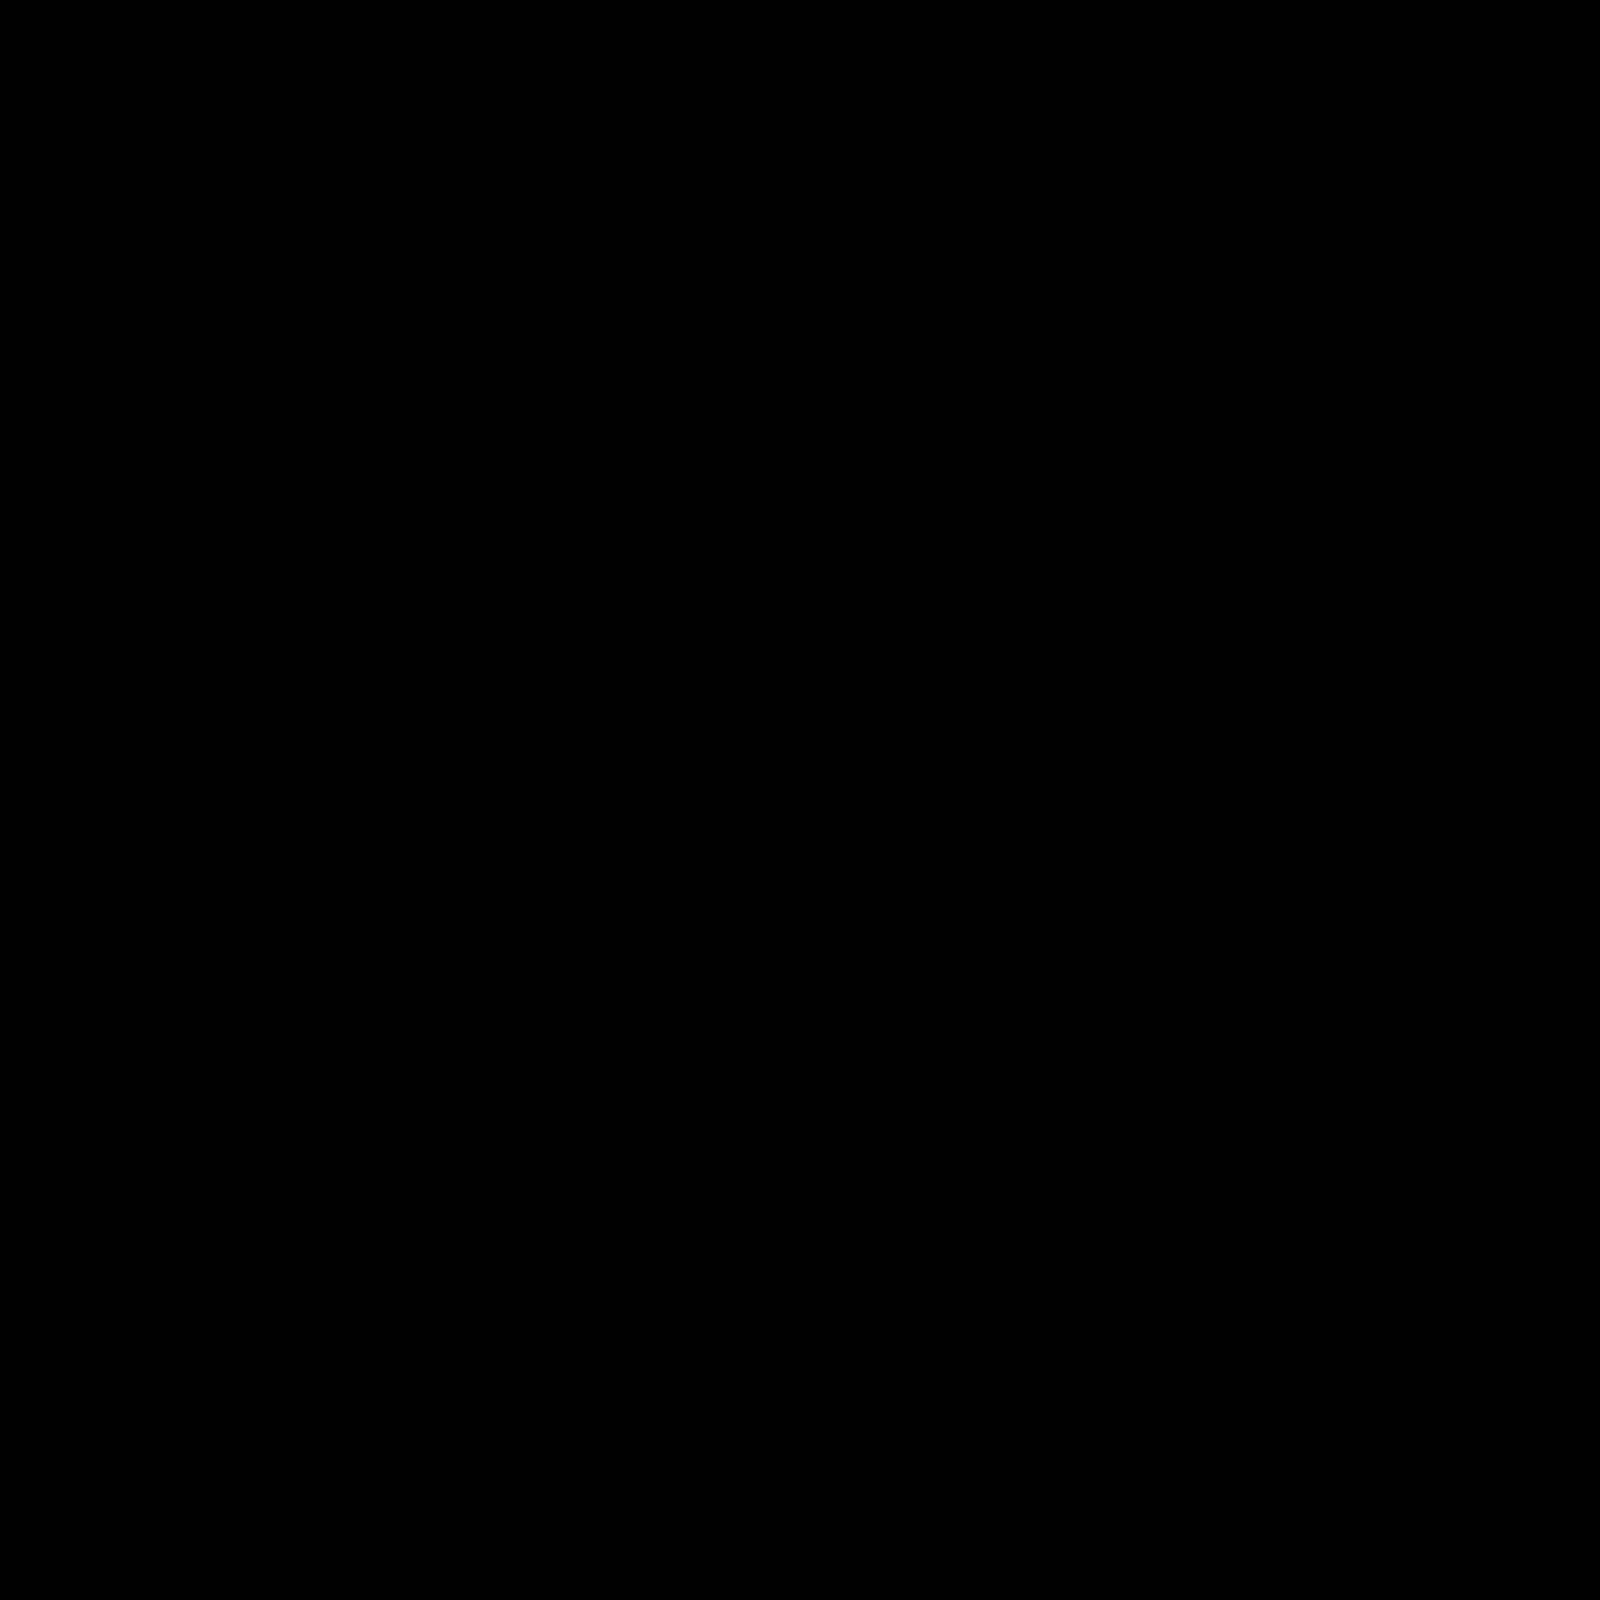 PTZ Camera icon